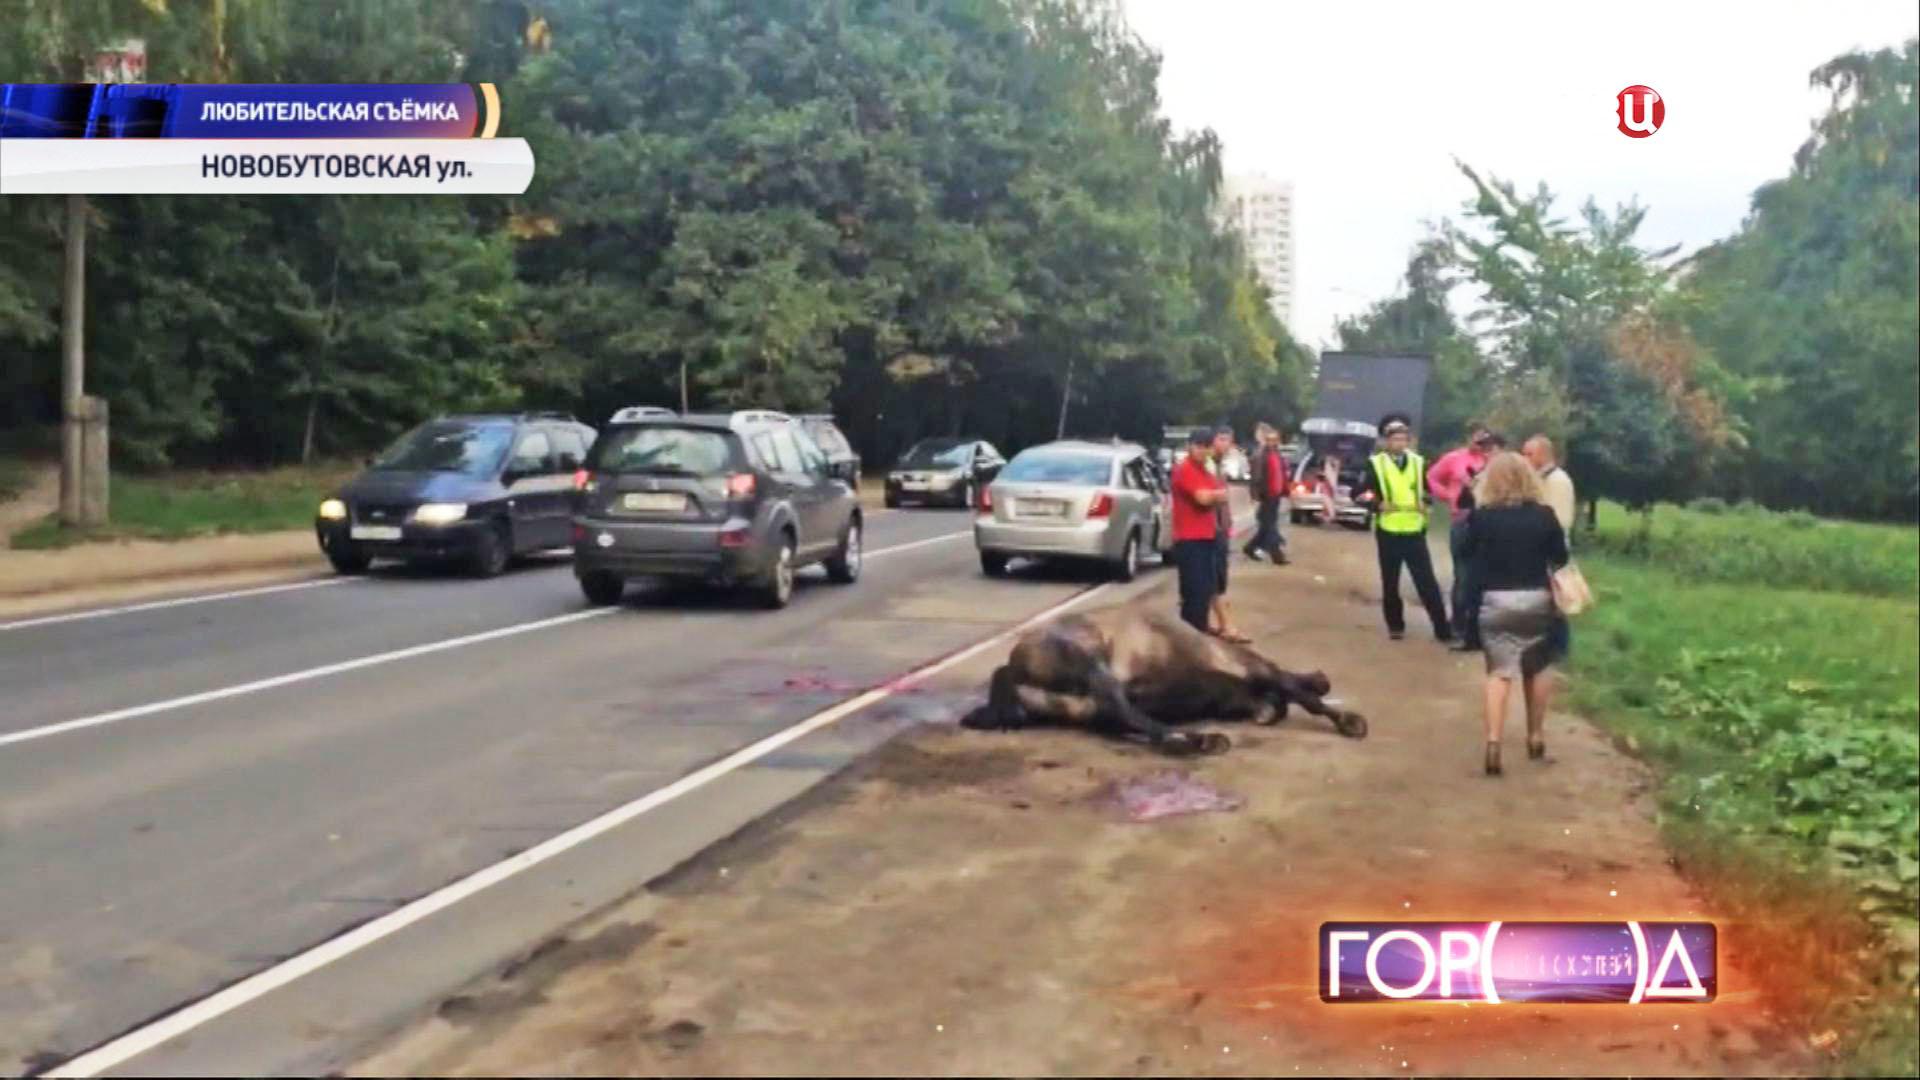 Сбитая лошадь на обочине дороги